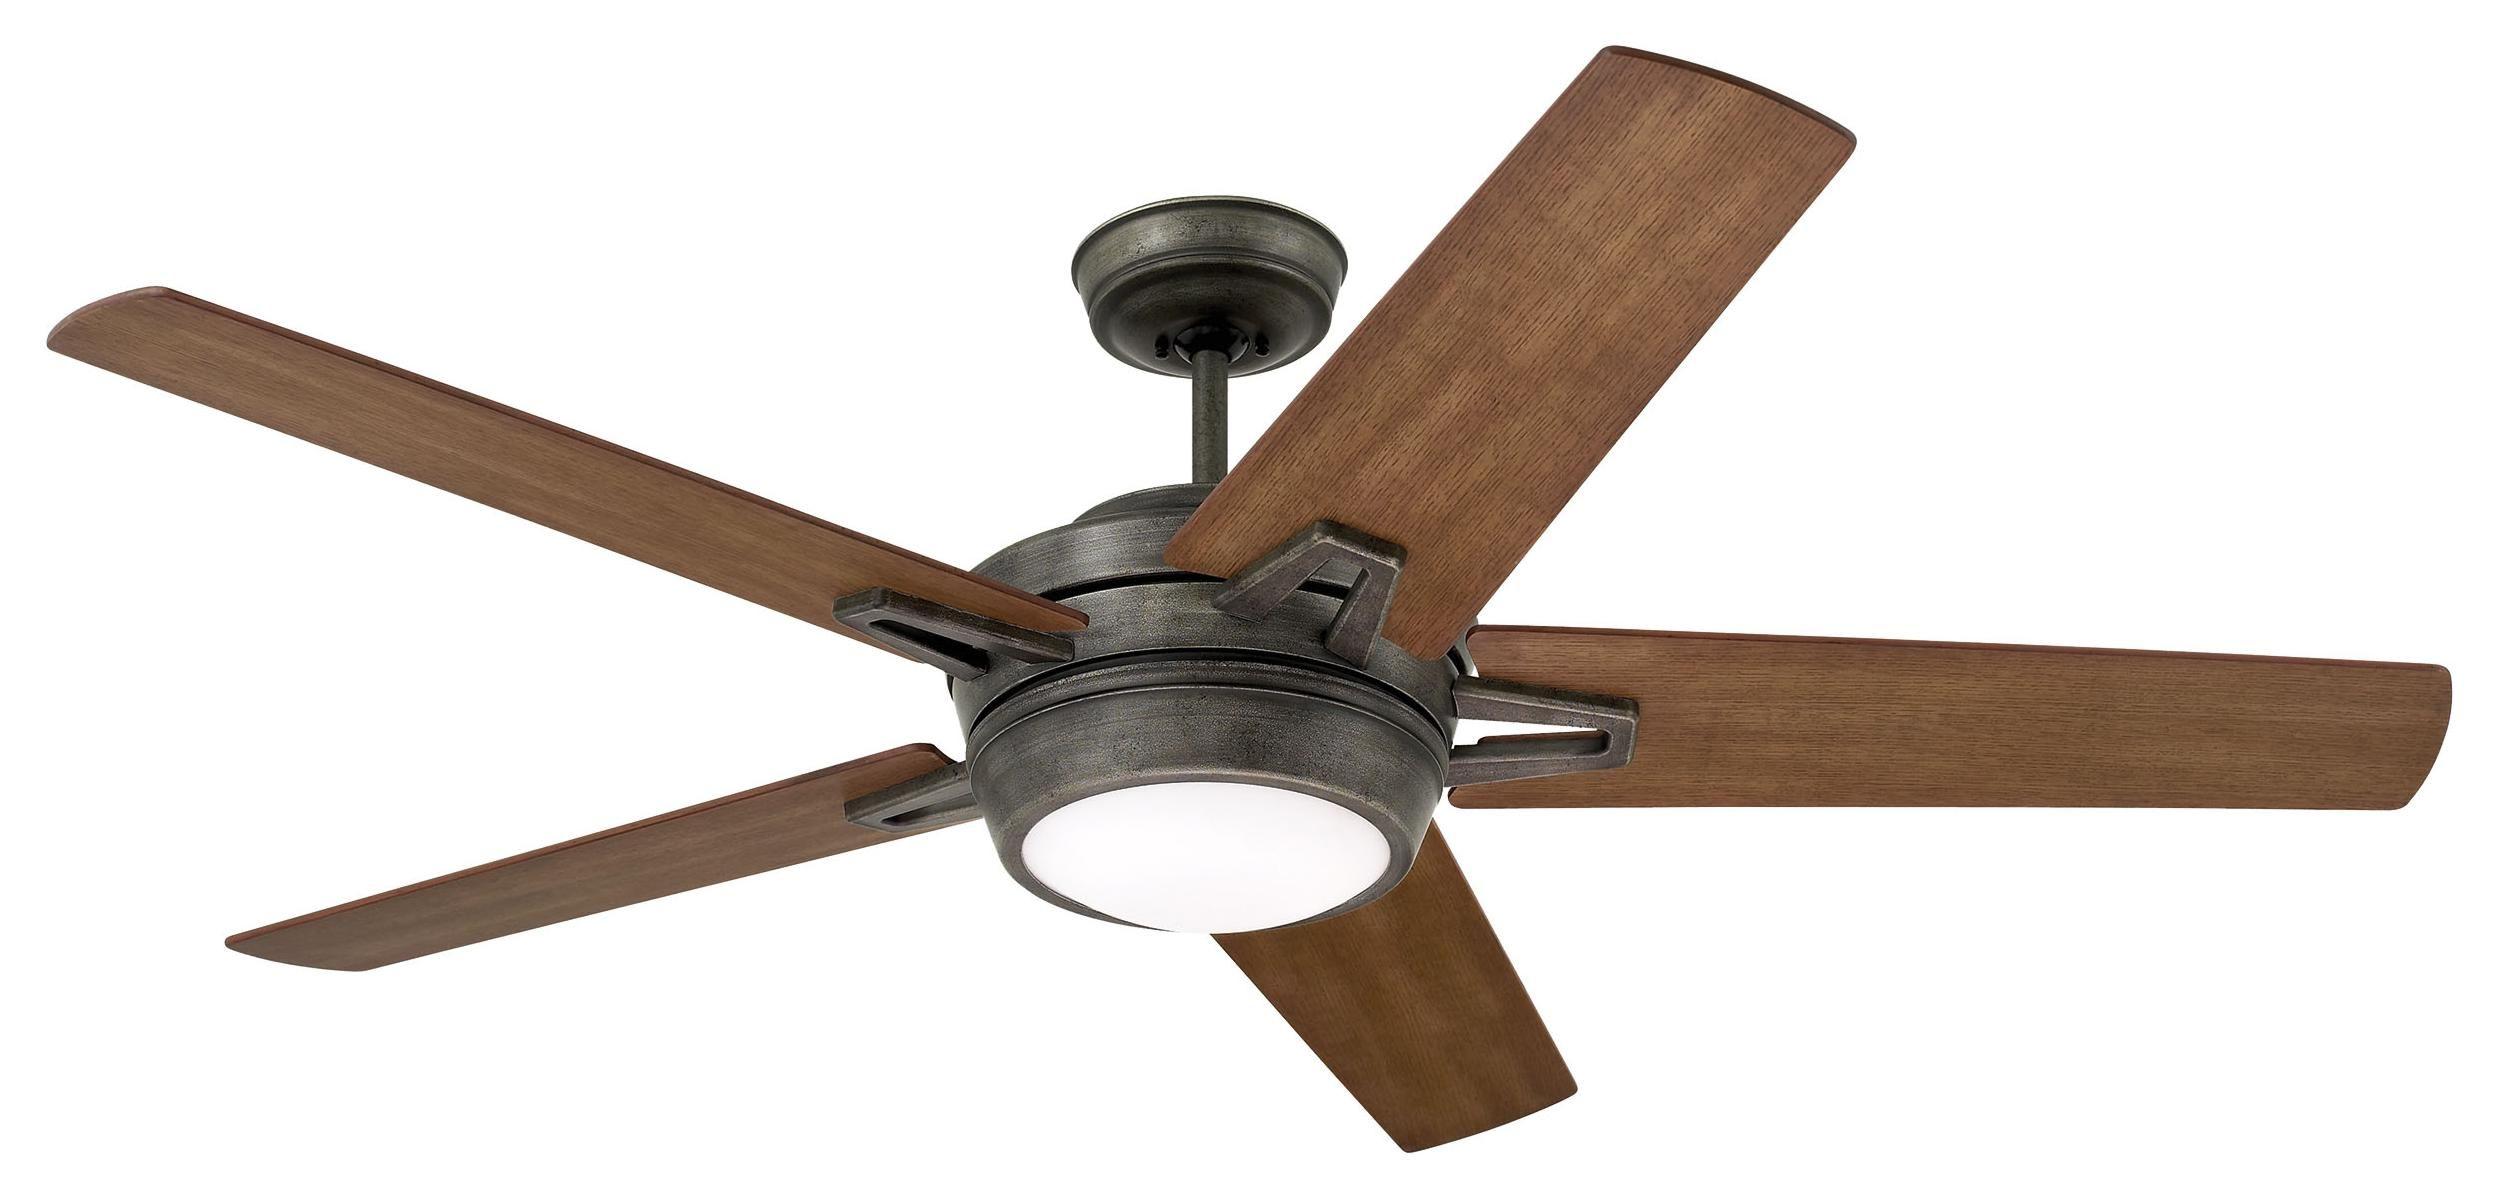 Emerson southtowne ceiling fan em cf4900vs in vintage steel emerson southtowne ceiling fan em cf4900vs in vintage steel guaranteed lowest price aloadofball Images